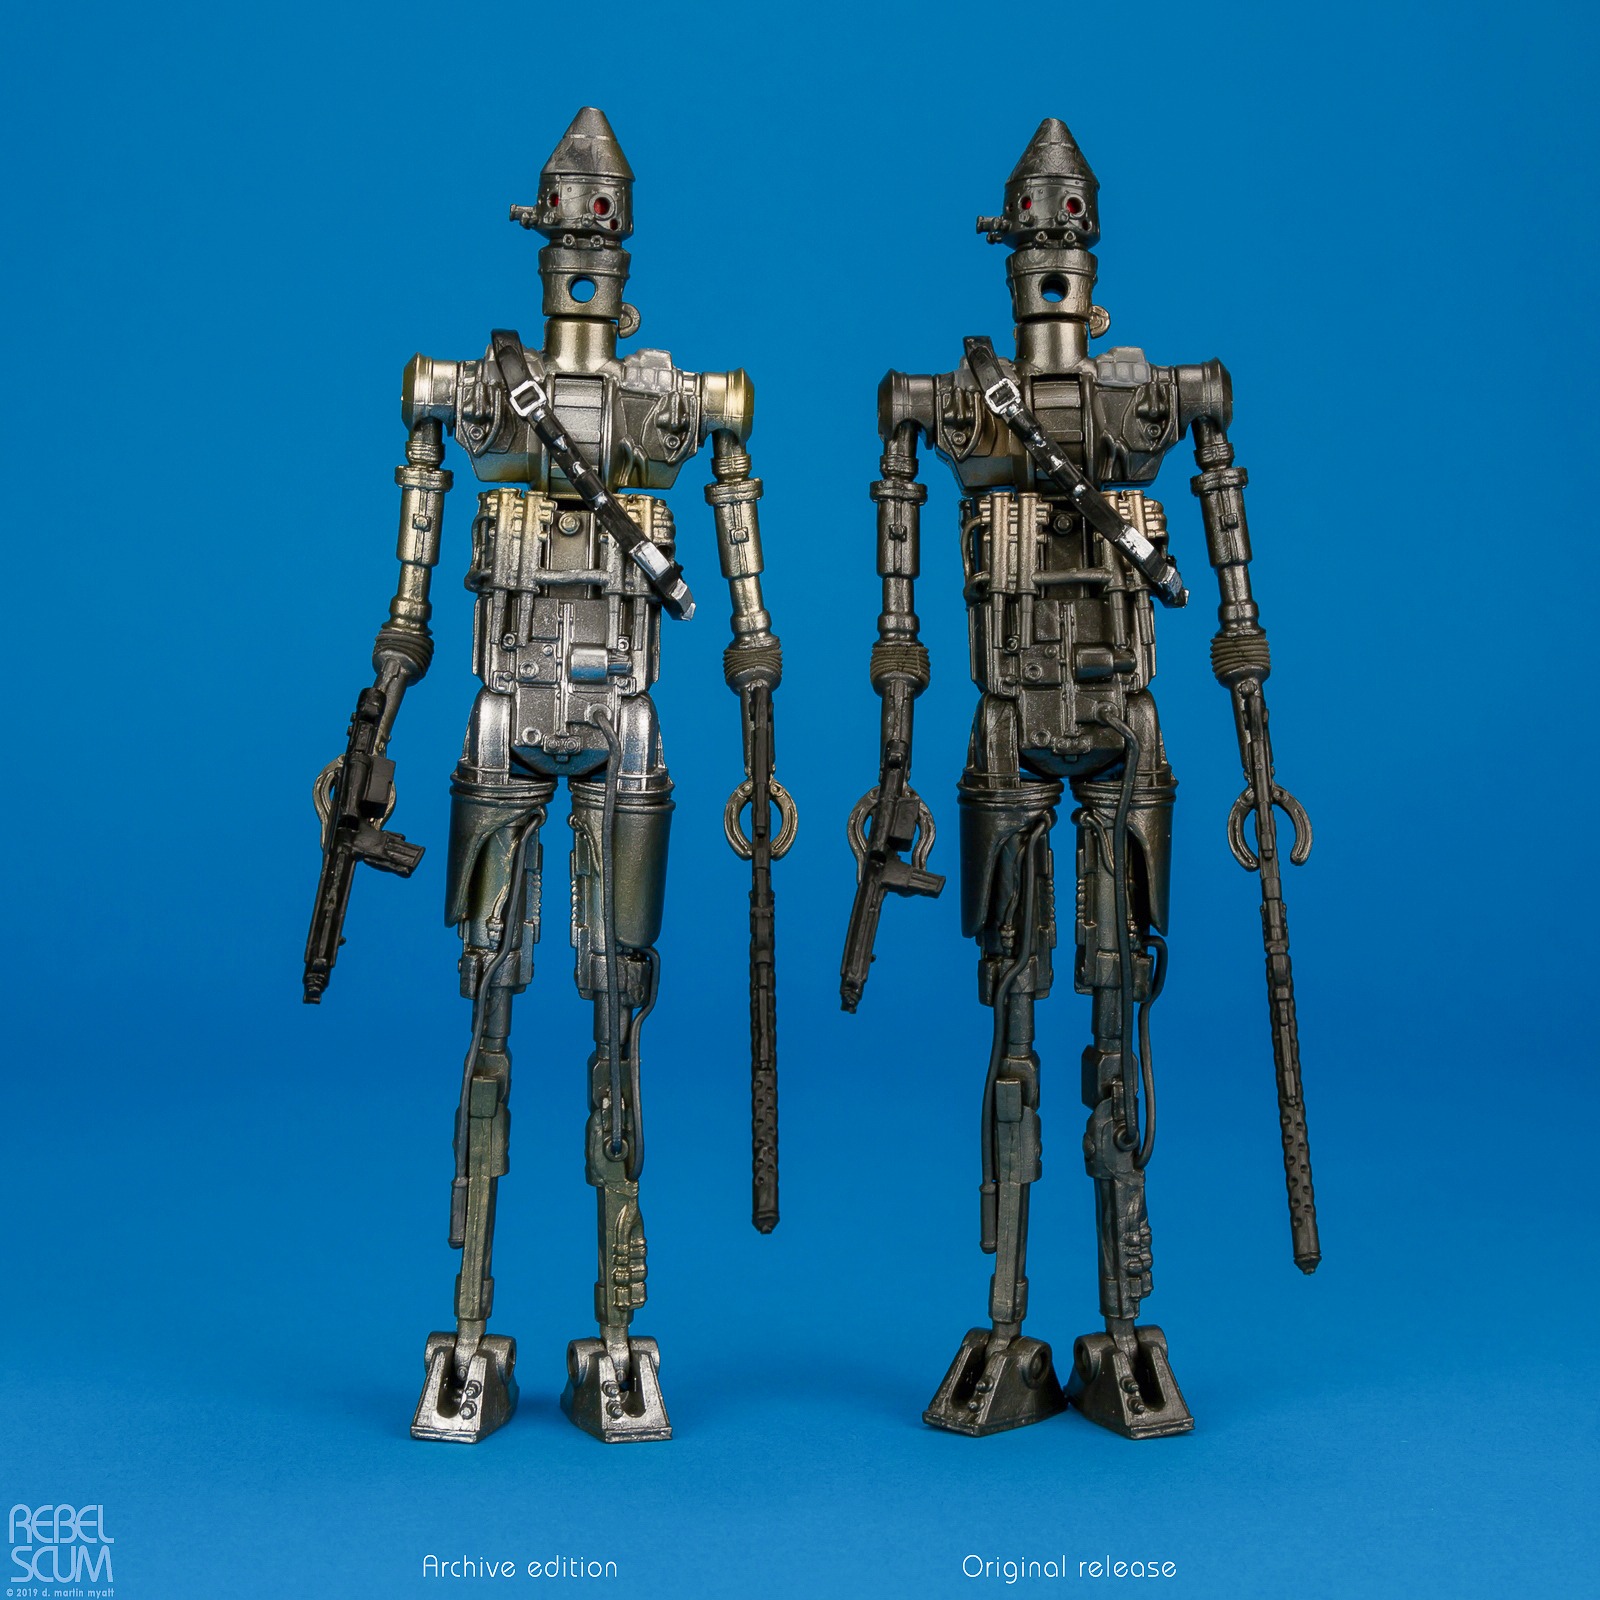 Star Wars The Black Series archive Figure figurine IG-88